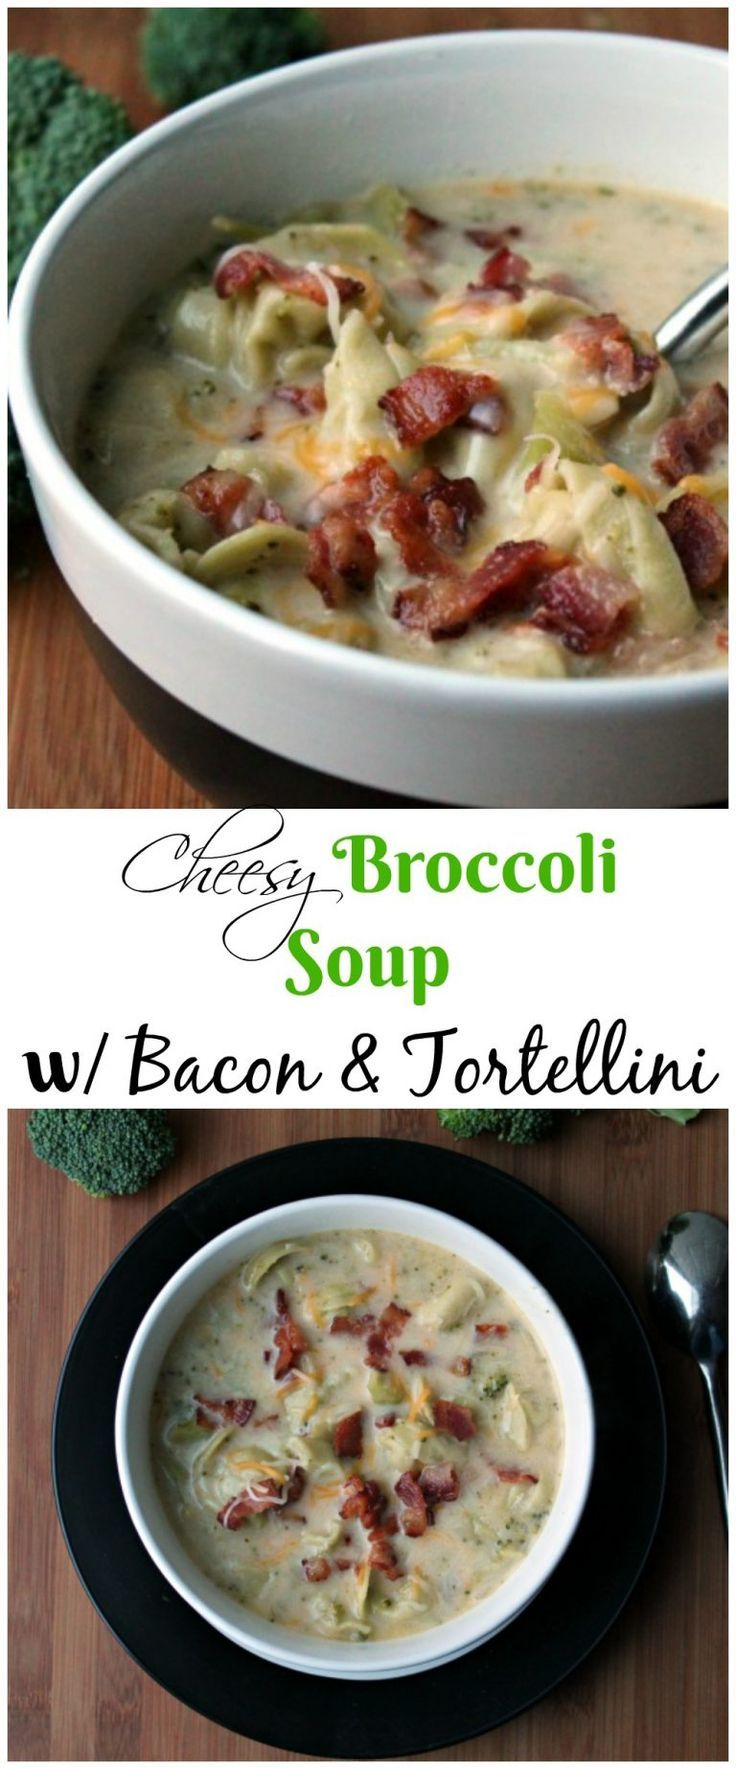 CHEESY Broccoli Soup w/ Bacon & Tortellini  - comfort in a bowl!